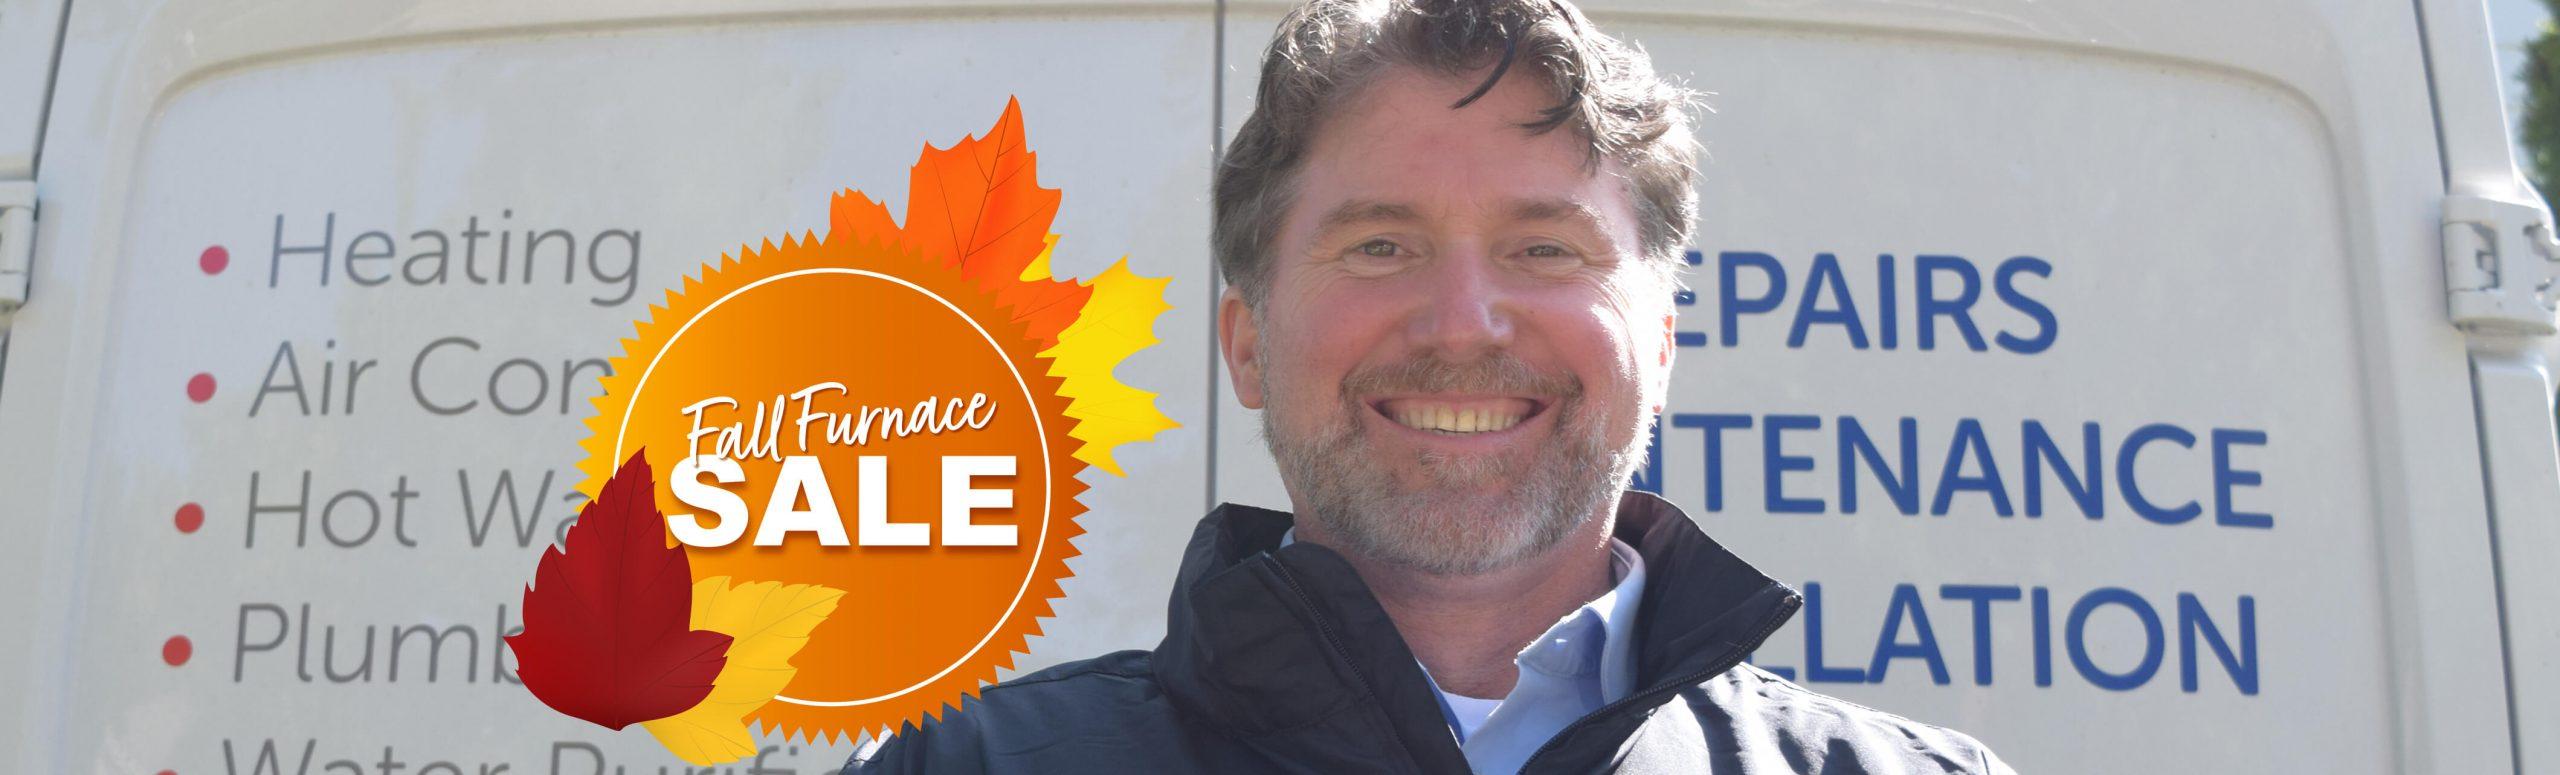 Fall Furnace Sale